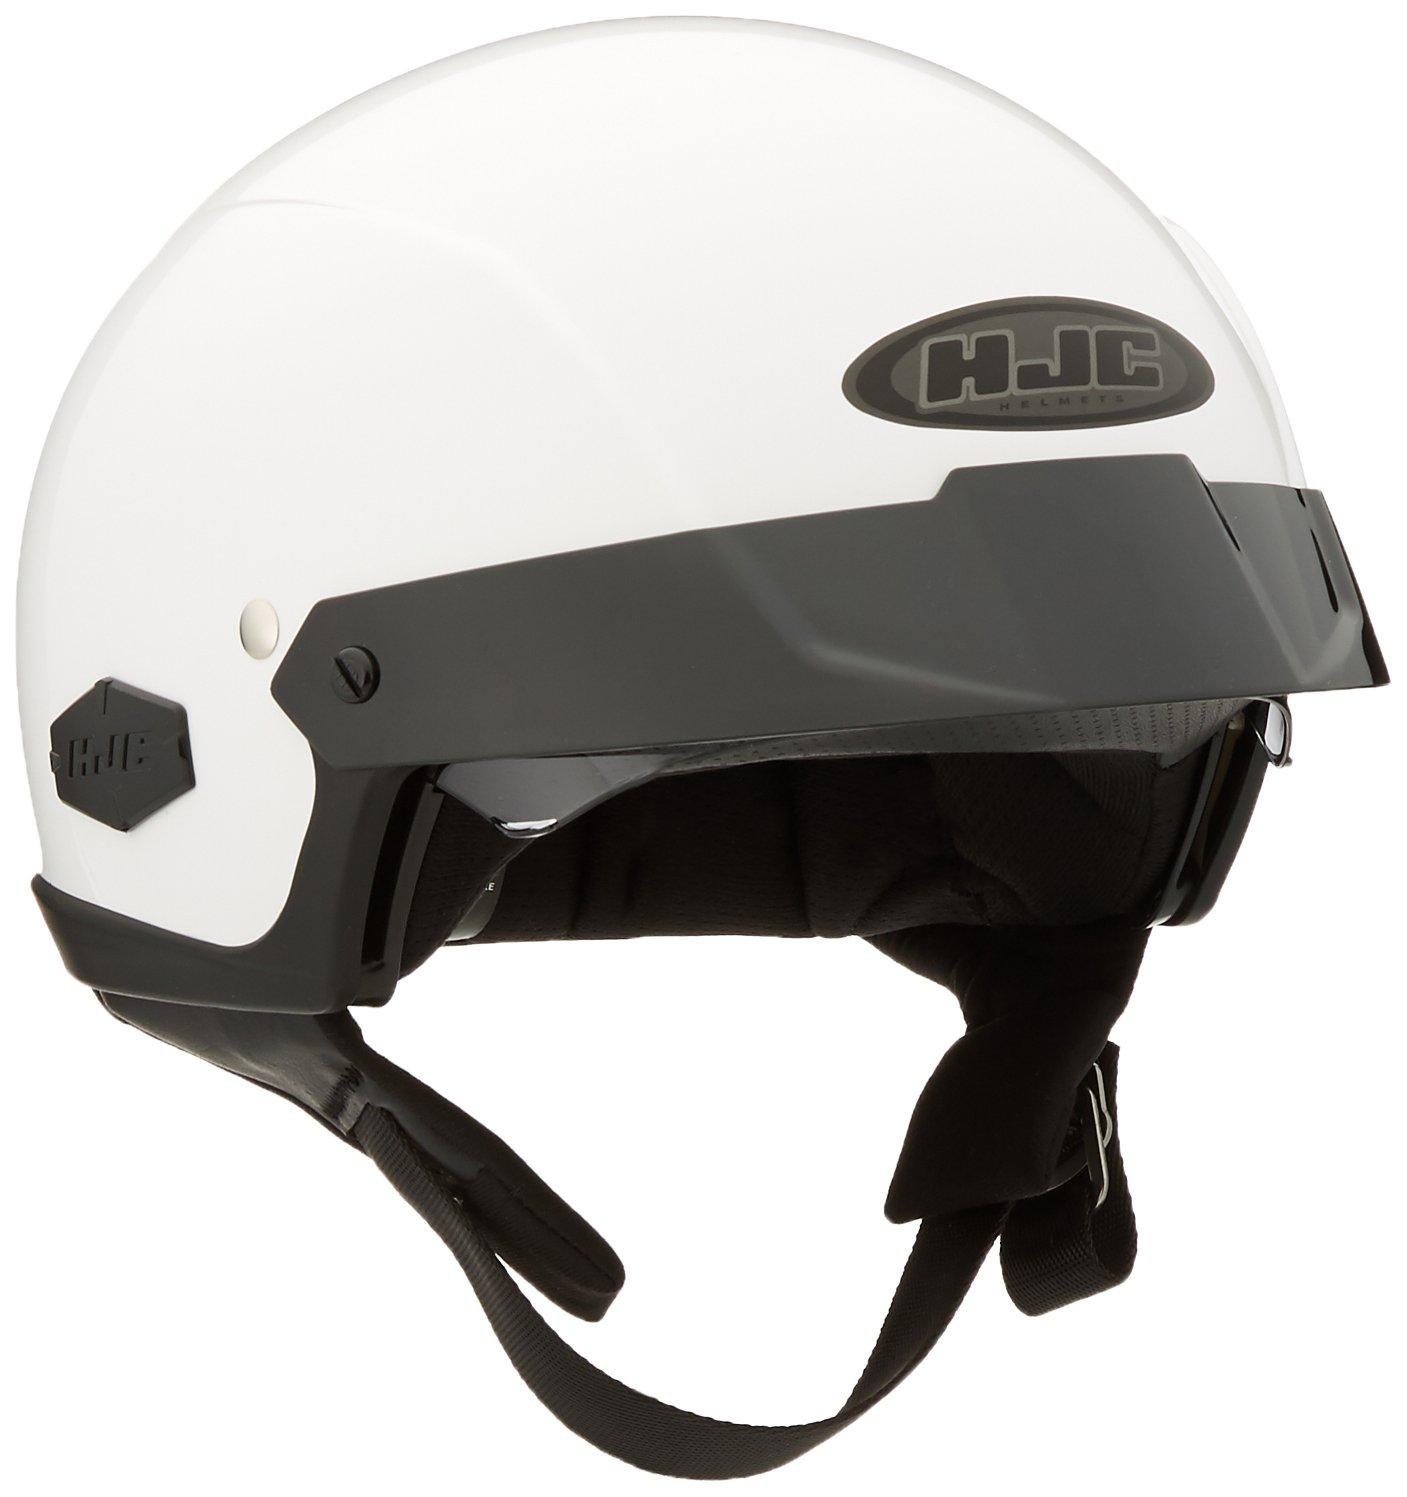 HJC IS-Cruiser Half-Shell Motorcycle Riding Helmet (White, X-Small)